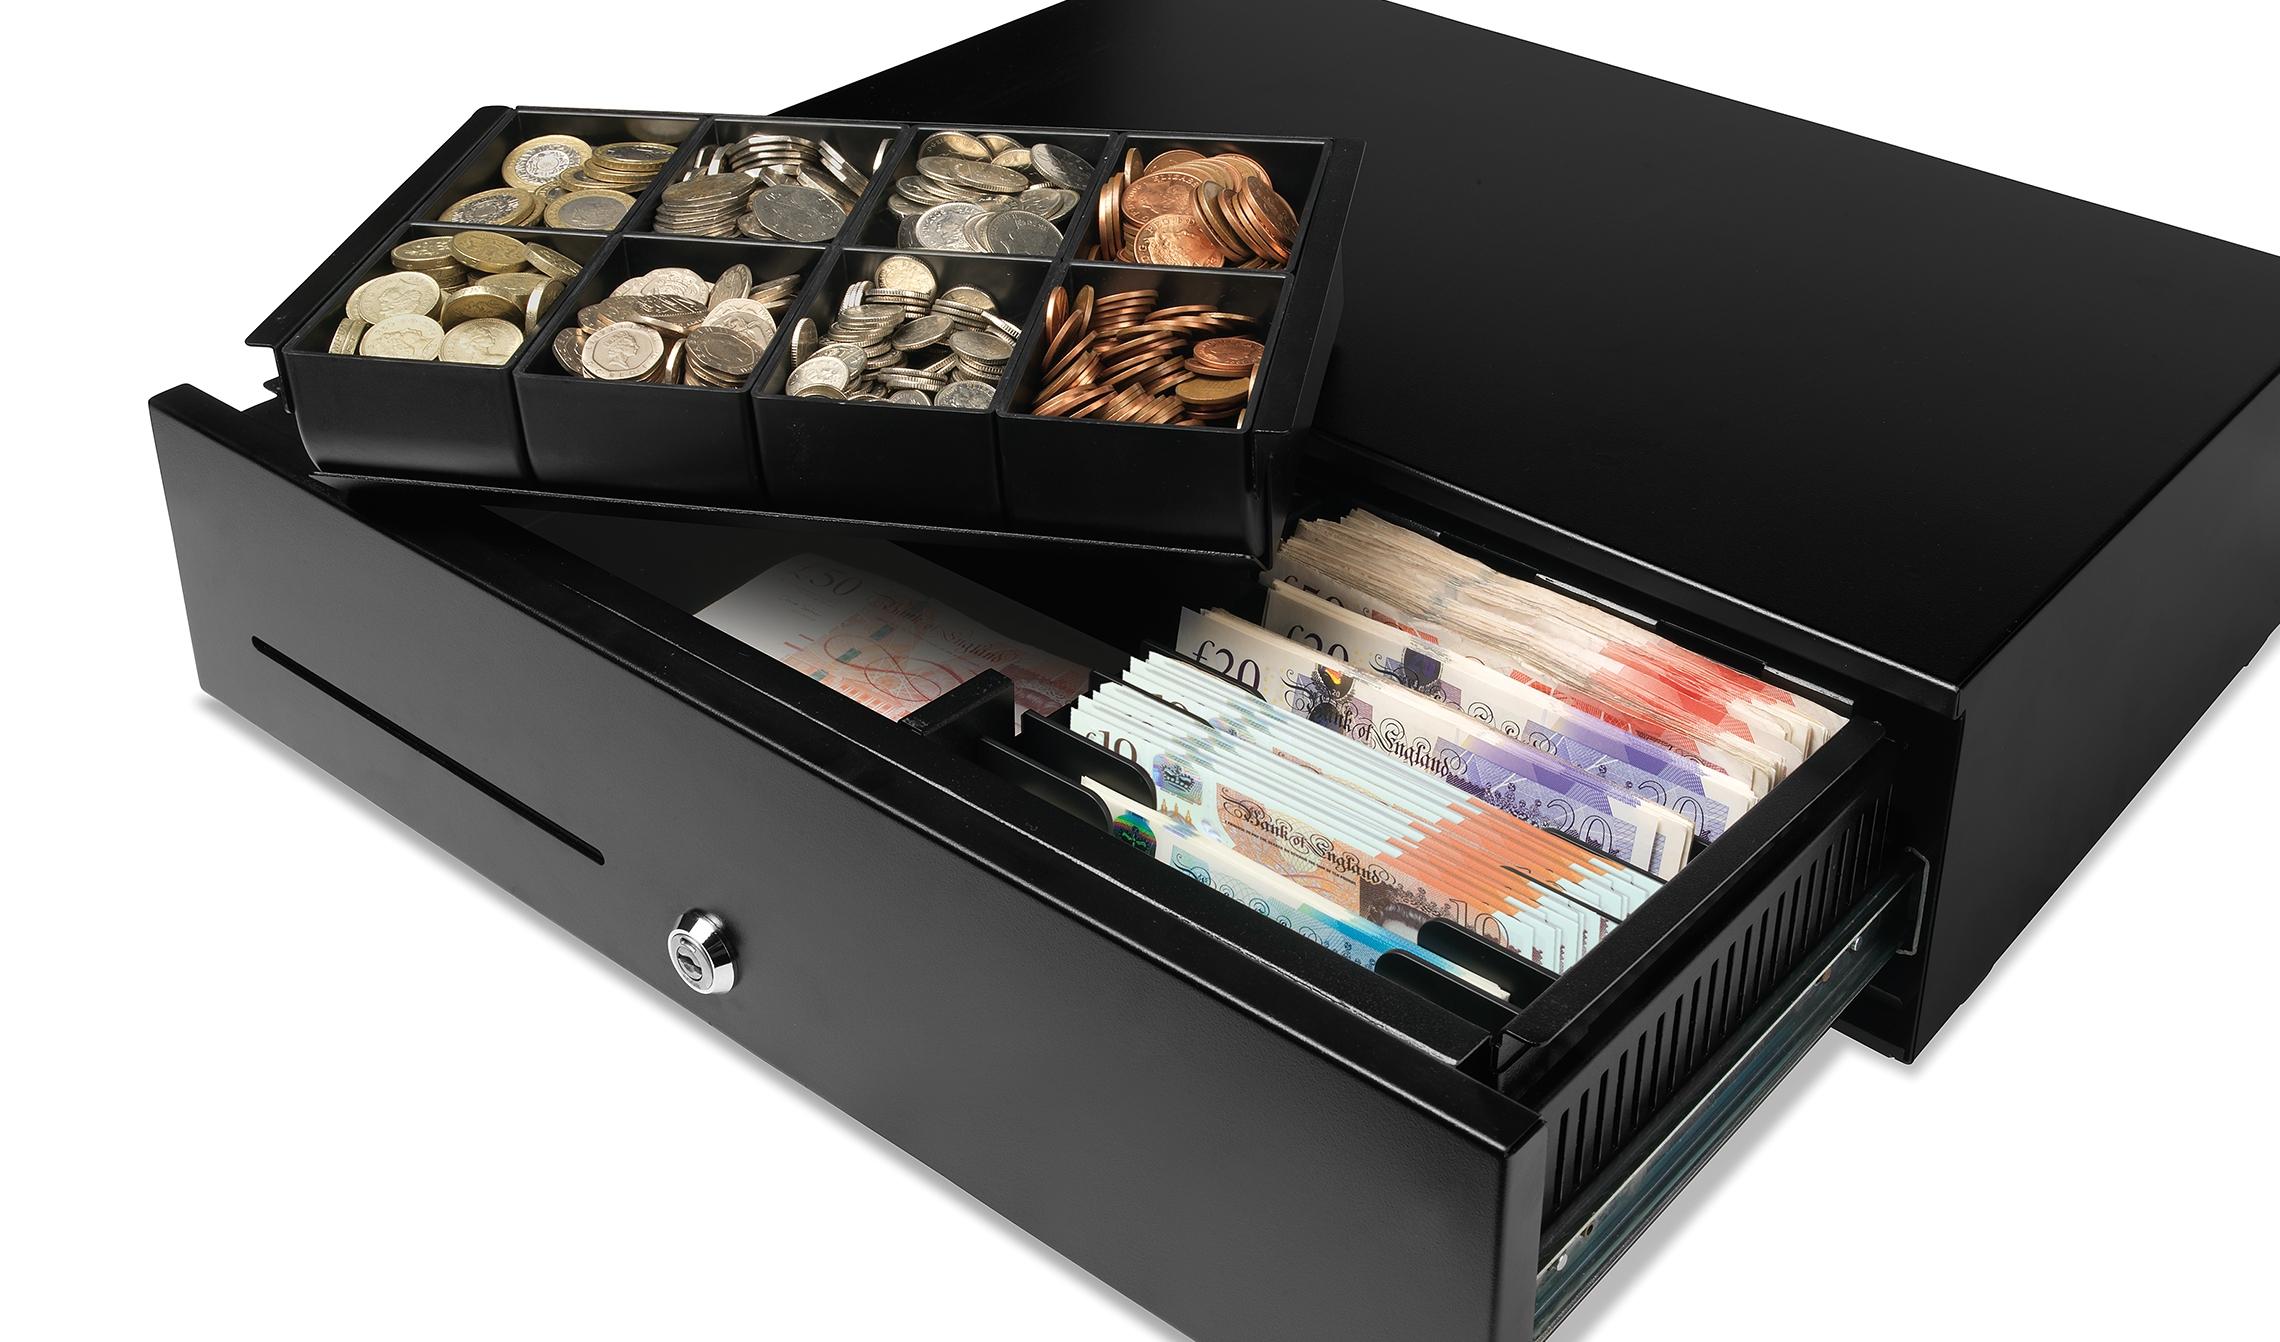 safescan-hd5030-cash-drawer